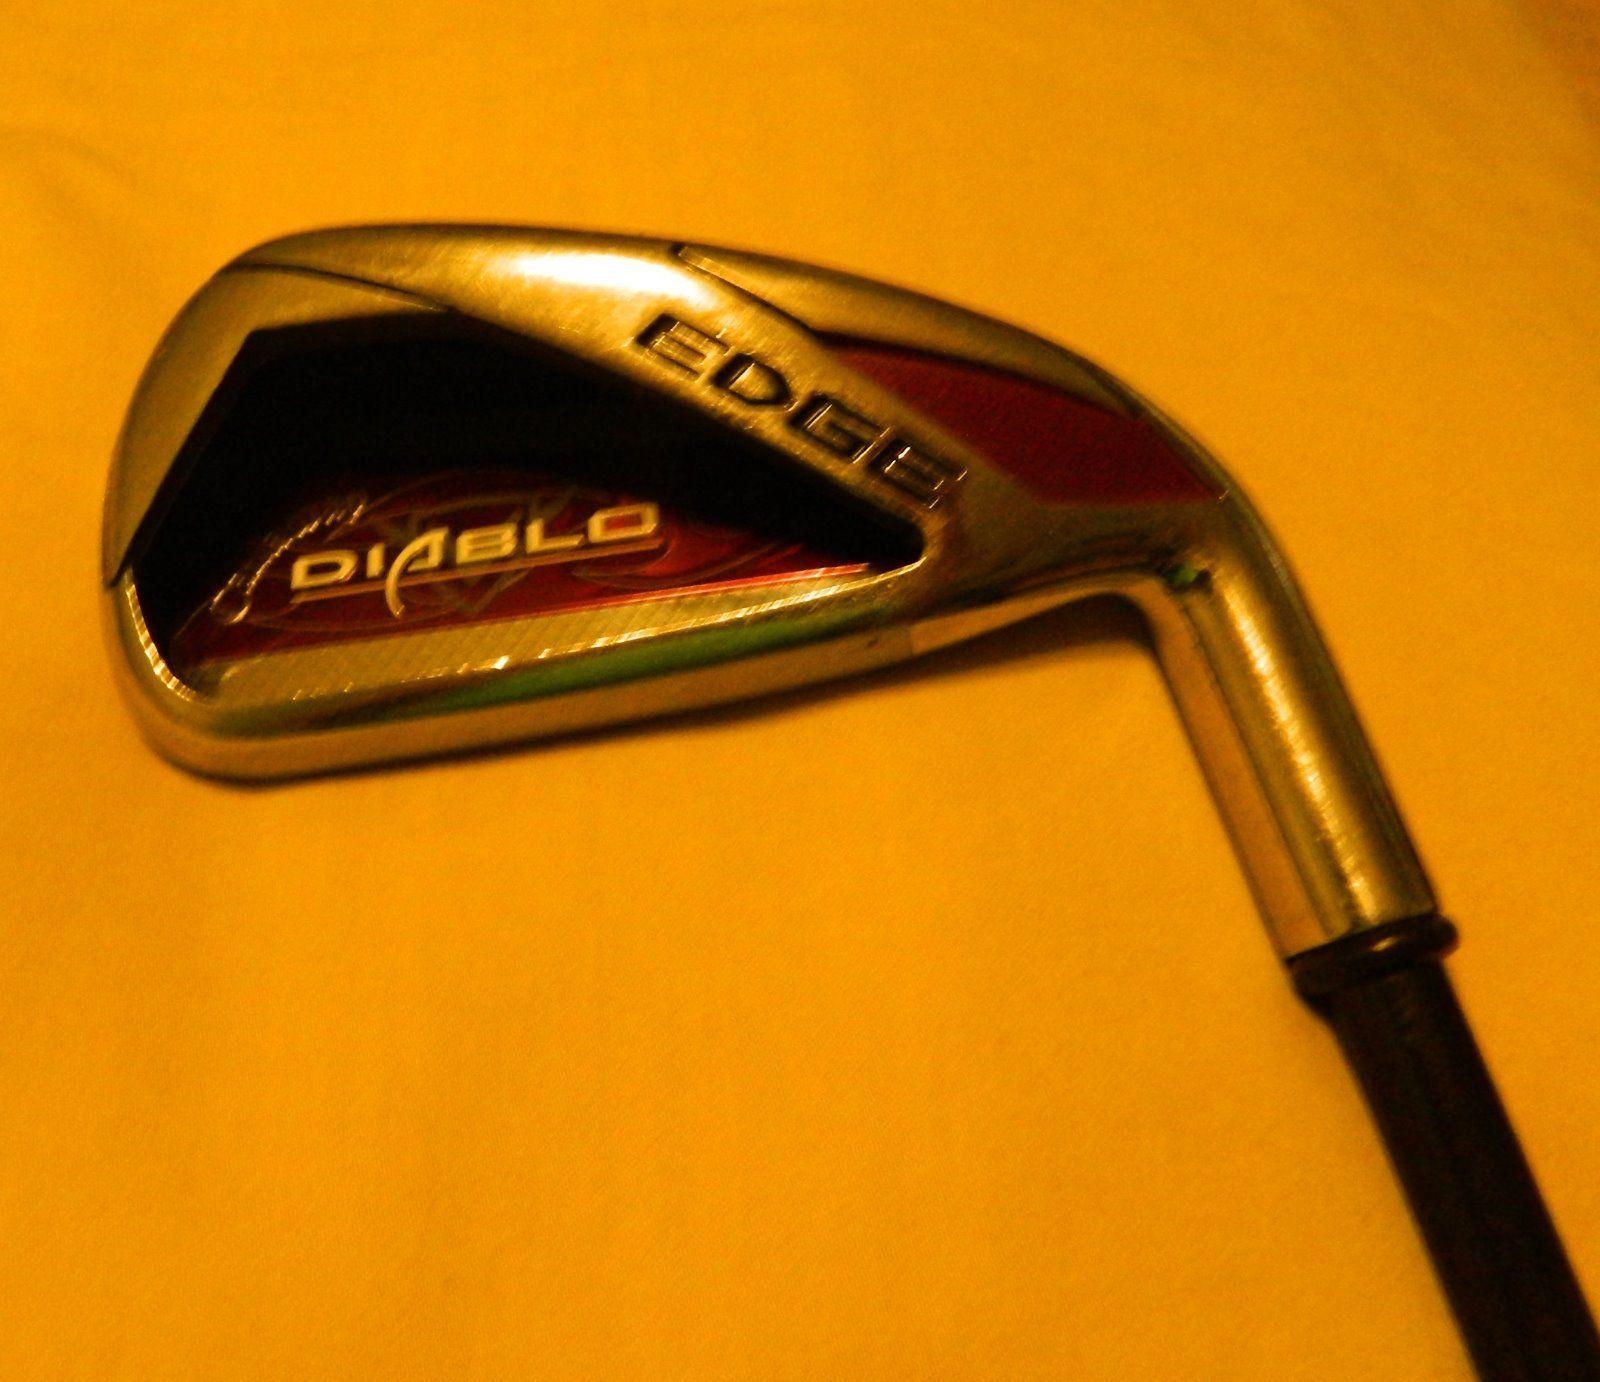 Callaway Diablo Edge Single 3 Iron Golf Club Golf clubs